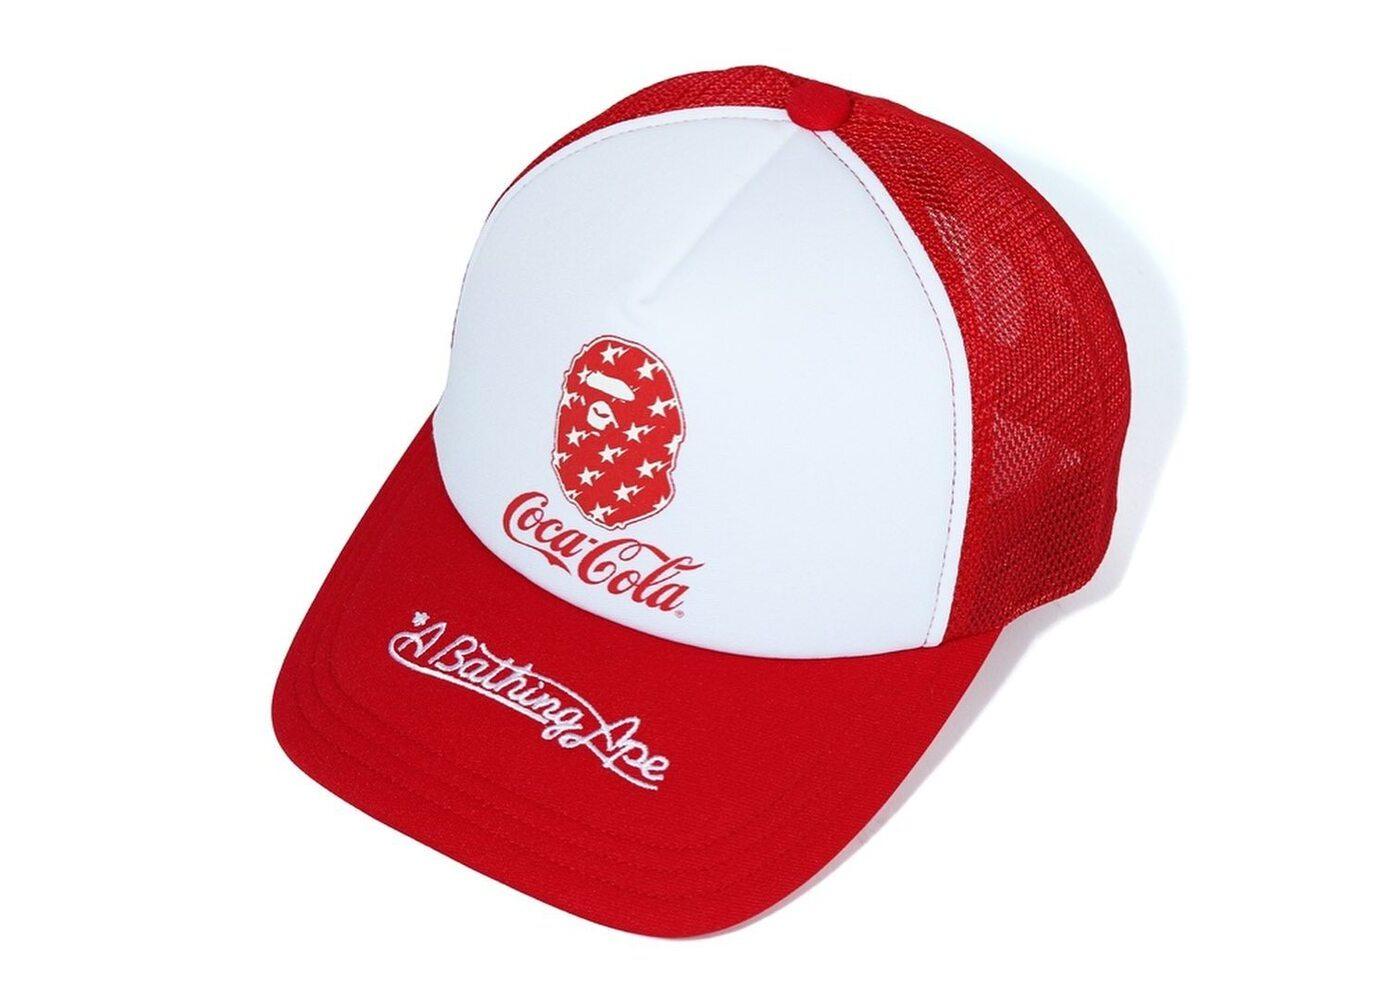 Bape x Coca Cola Mesh Cap Red (SS20)の写真